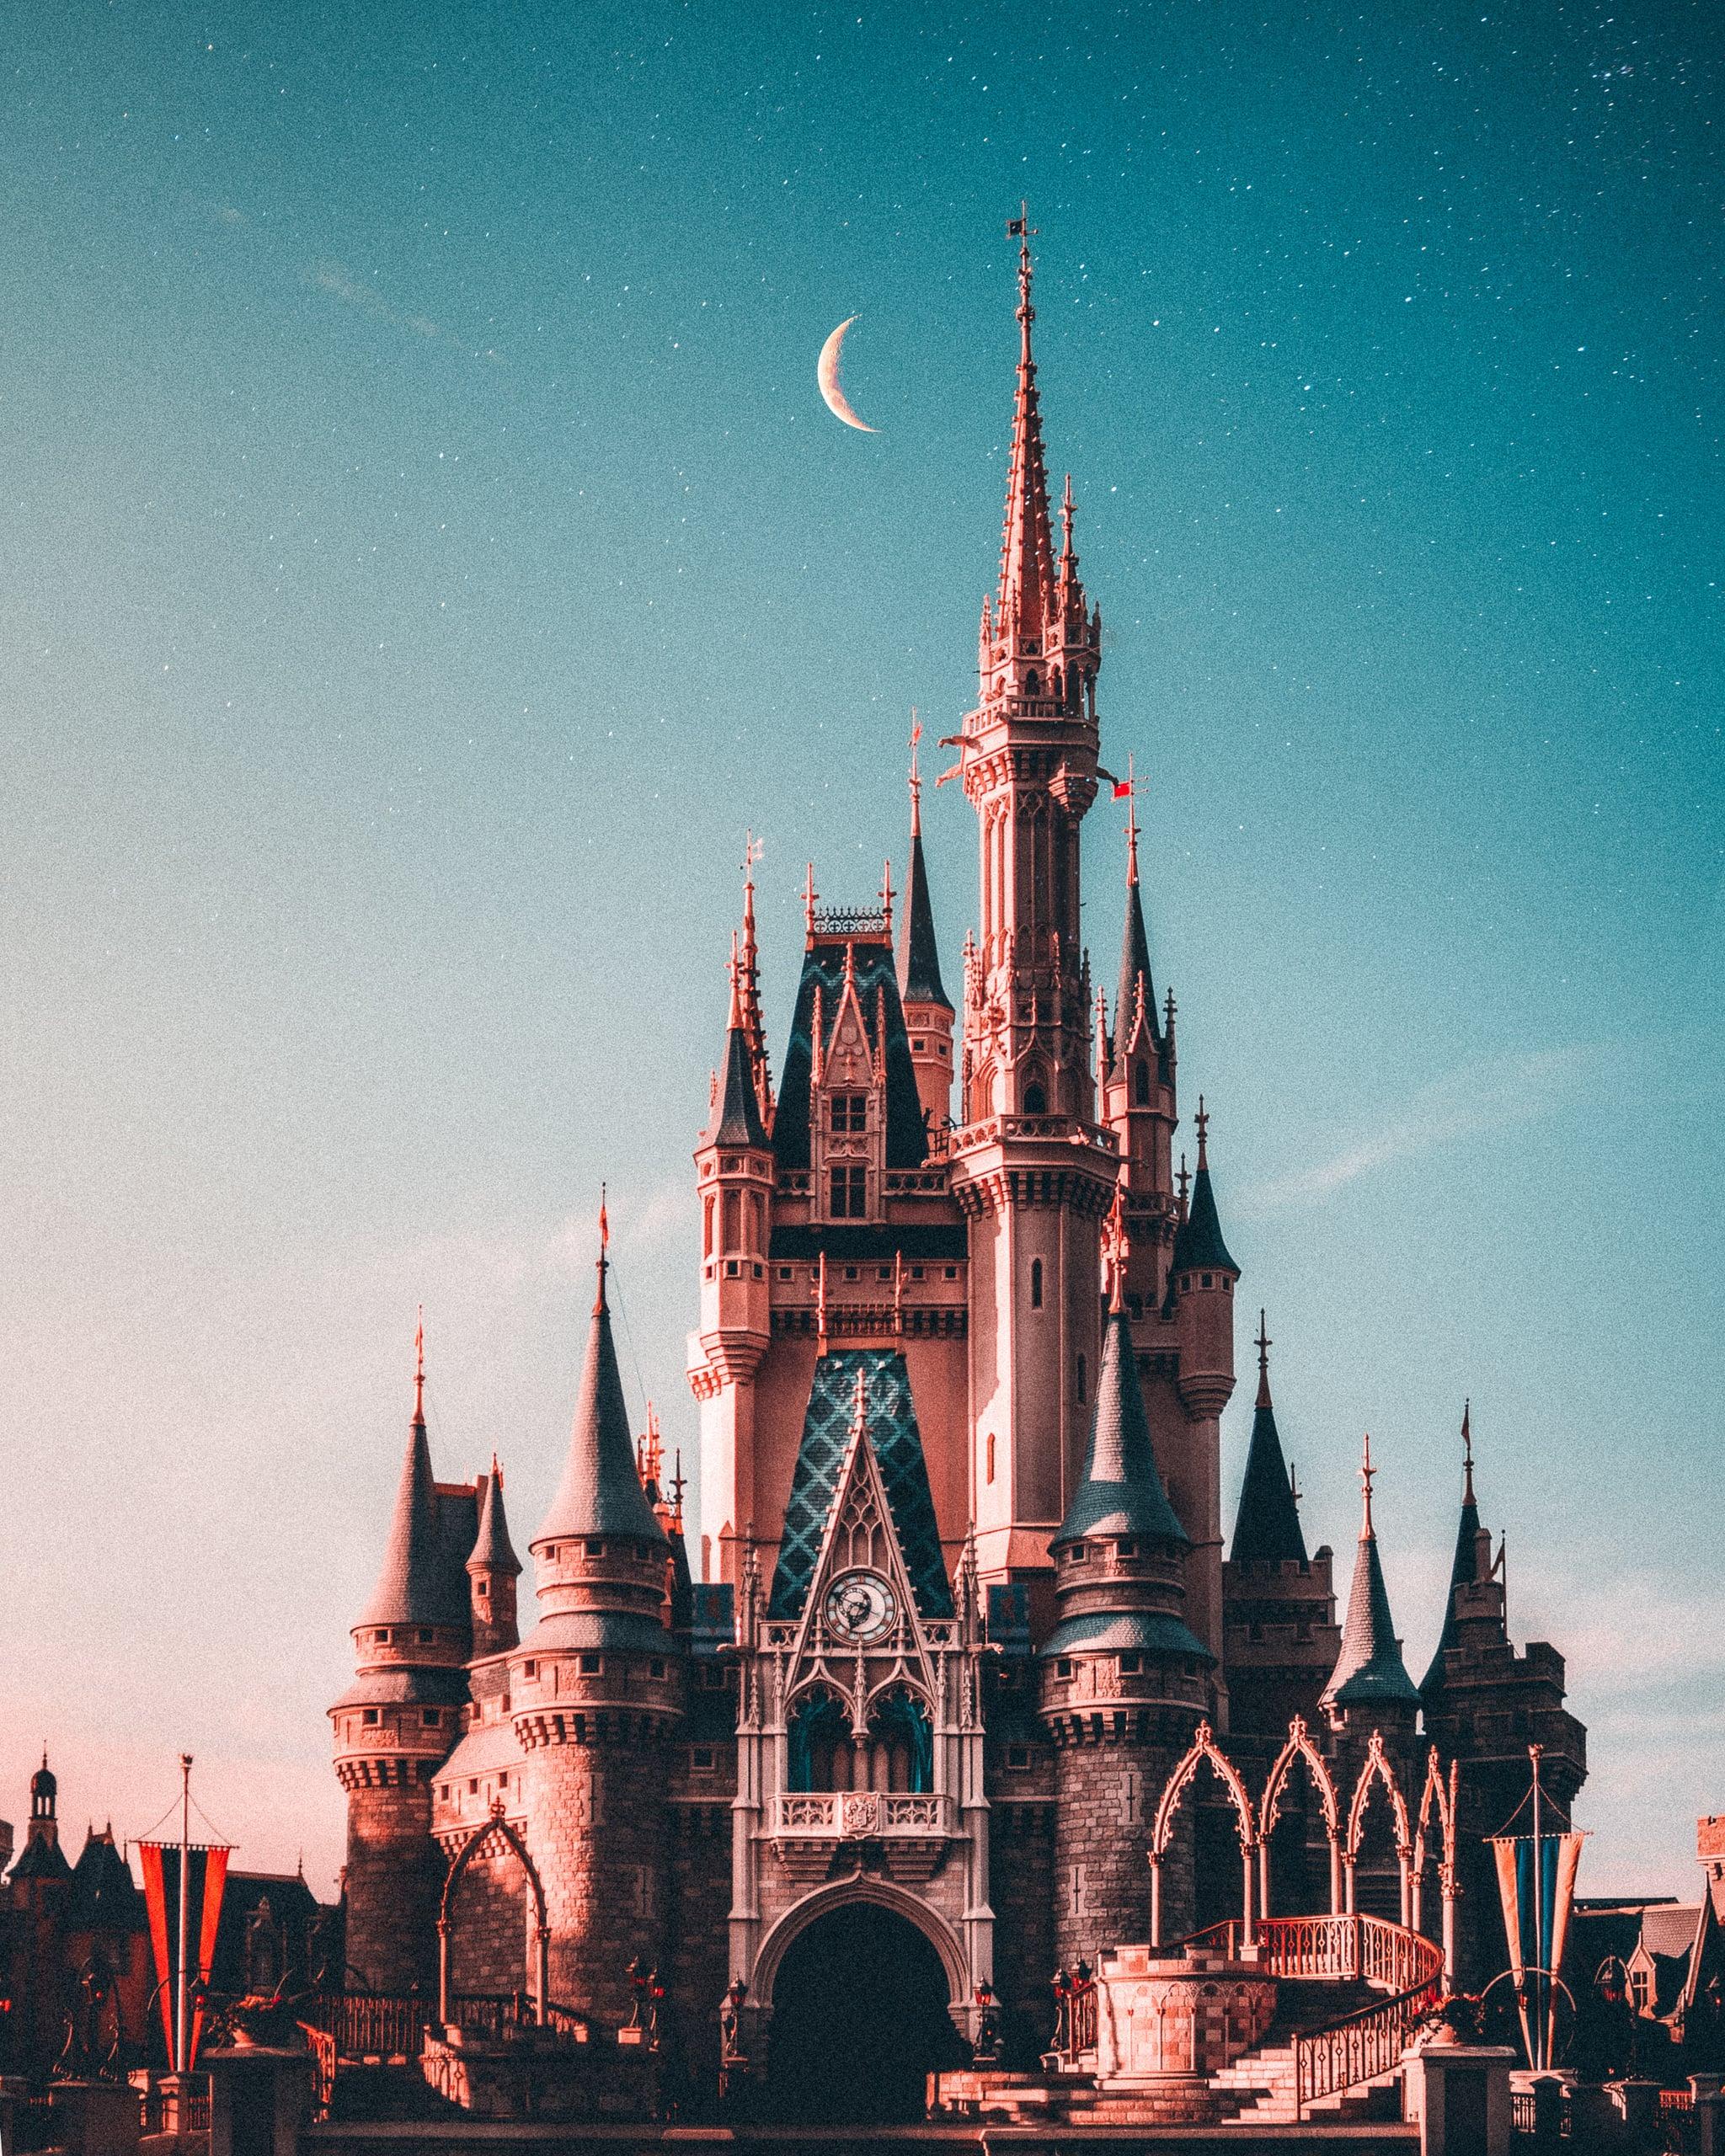 Disney World Will Be Closed Indefinitely Due to the Coronavirus Outbreak